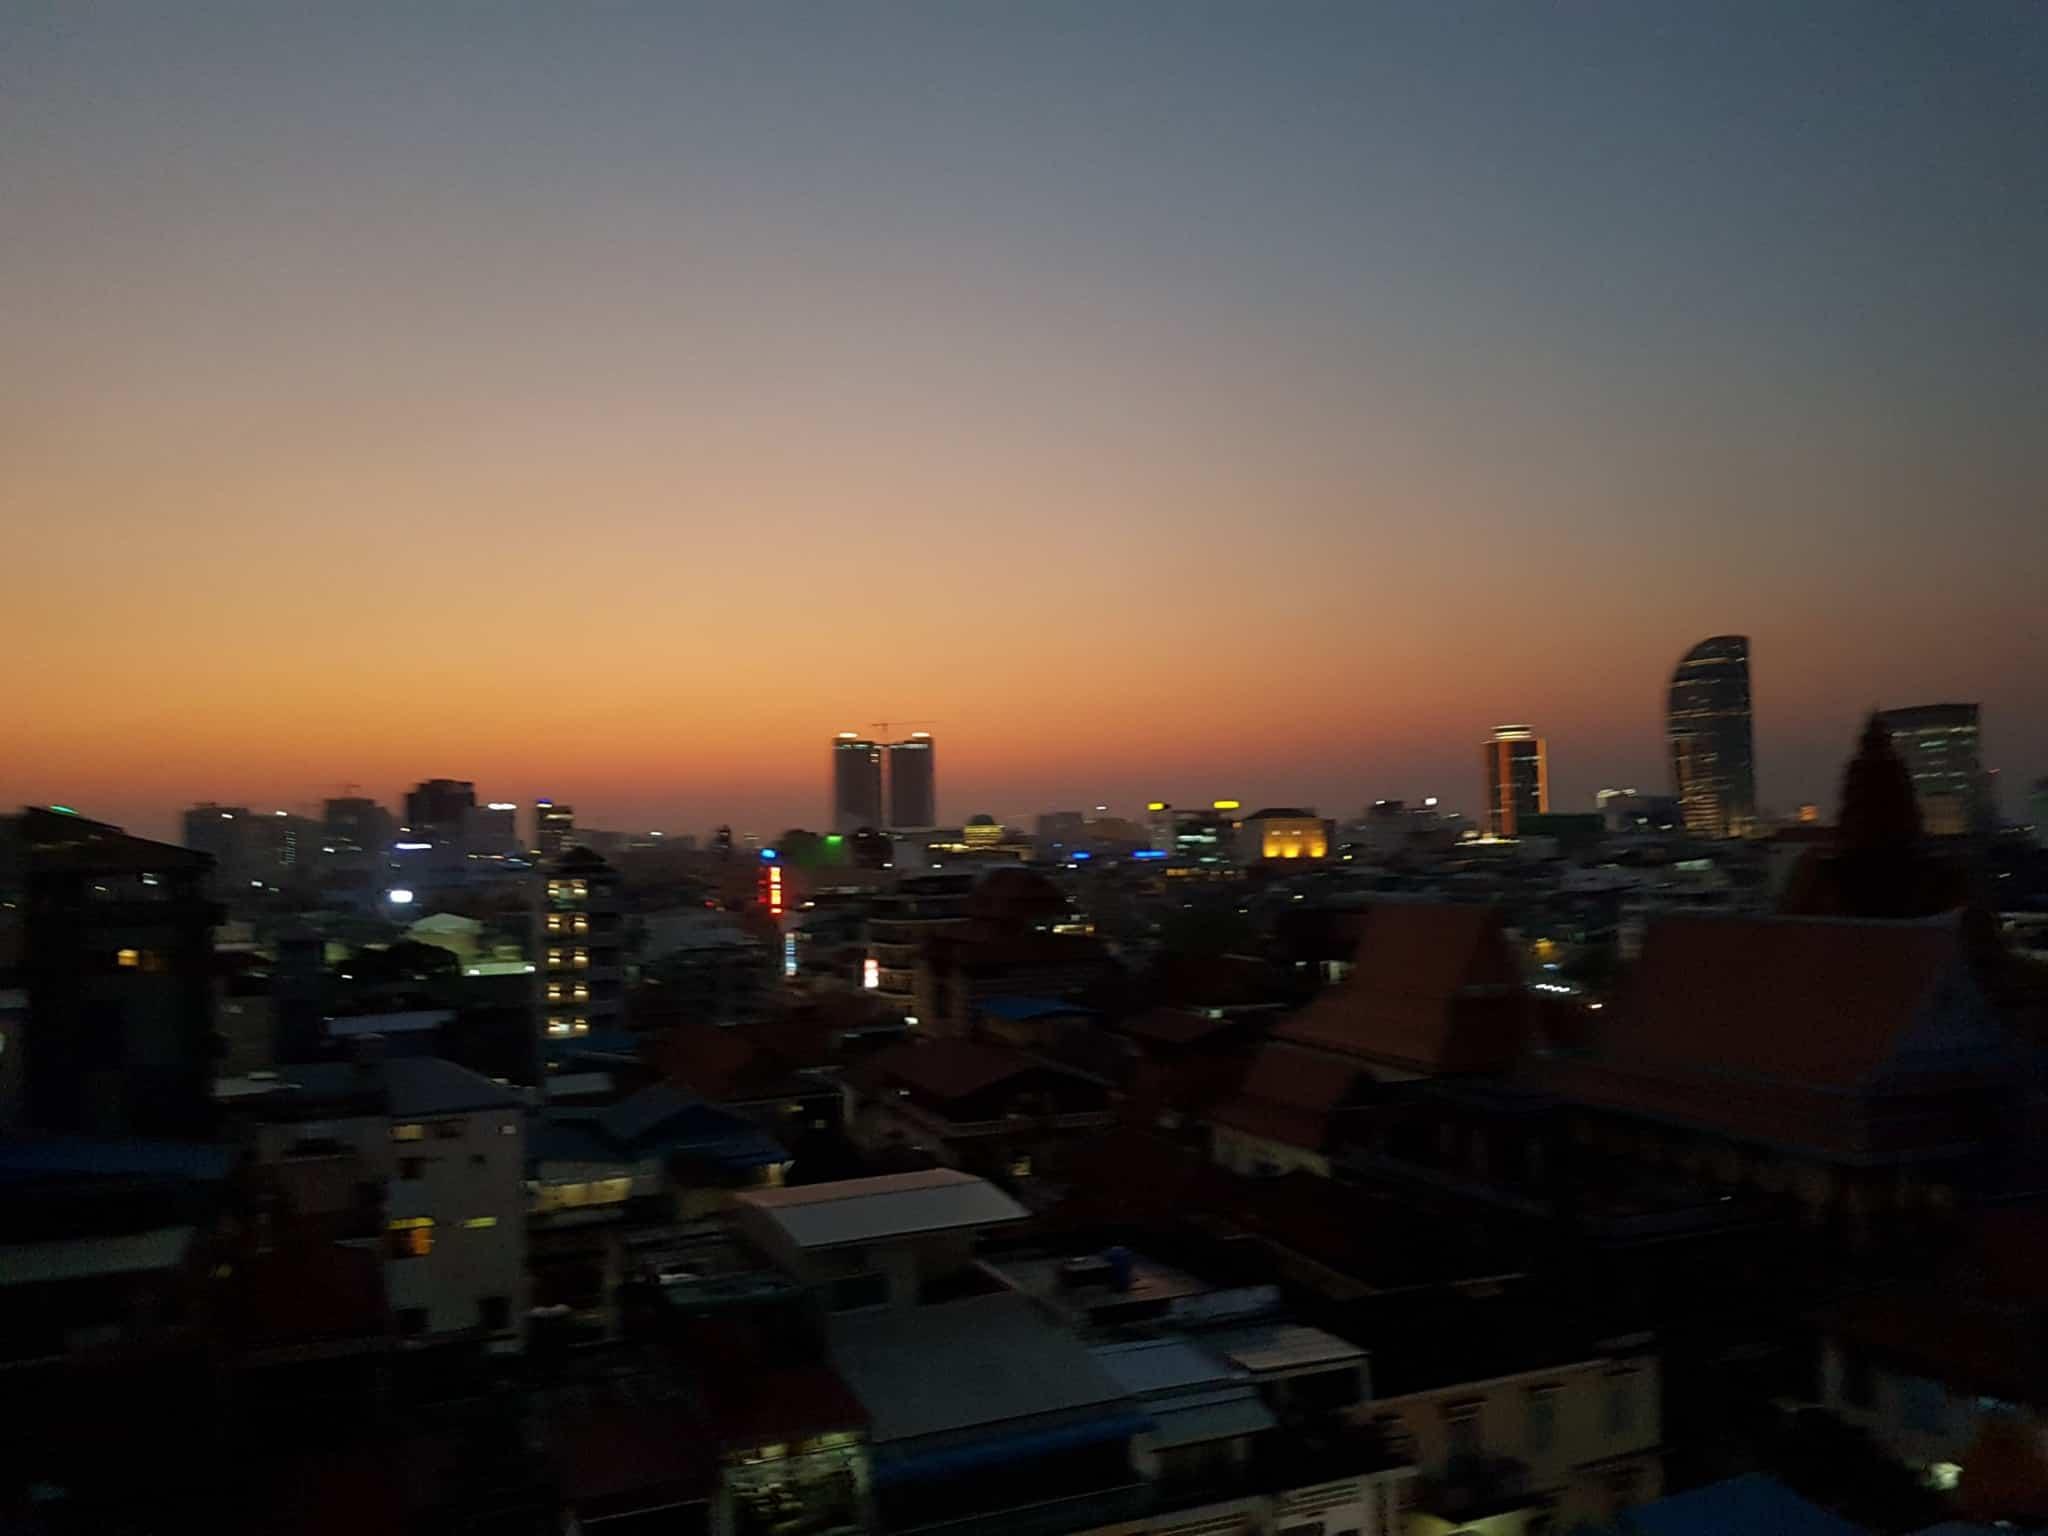 Cambodge, premiers pas à Phnom Penh 👟 7